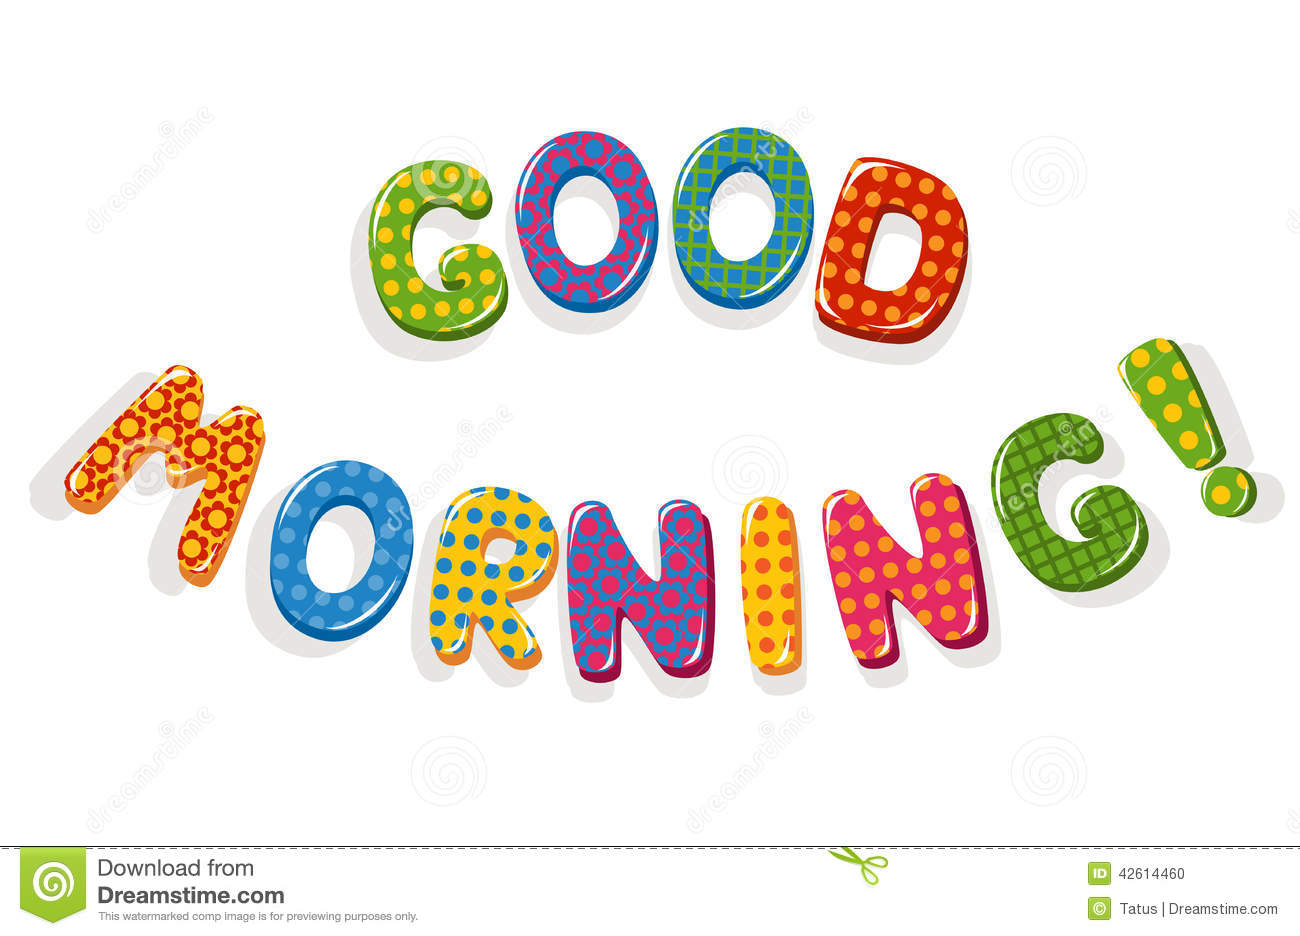 good morning sunday clipart #6